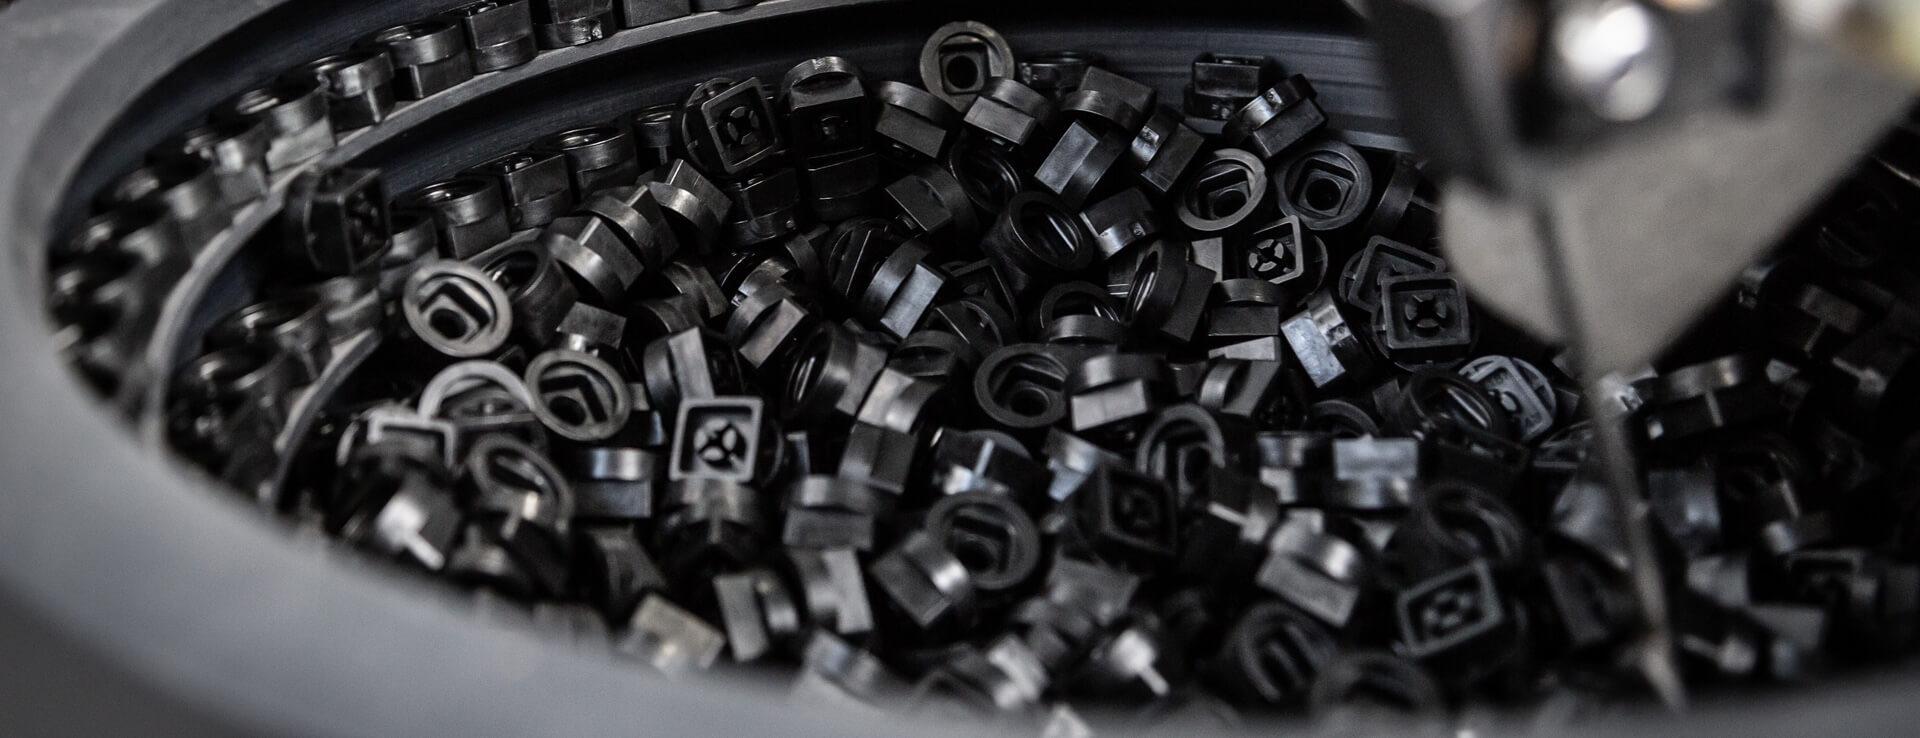 slider-3.jpg – LMB Kunstofftechnik GmbH